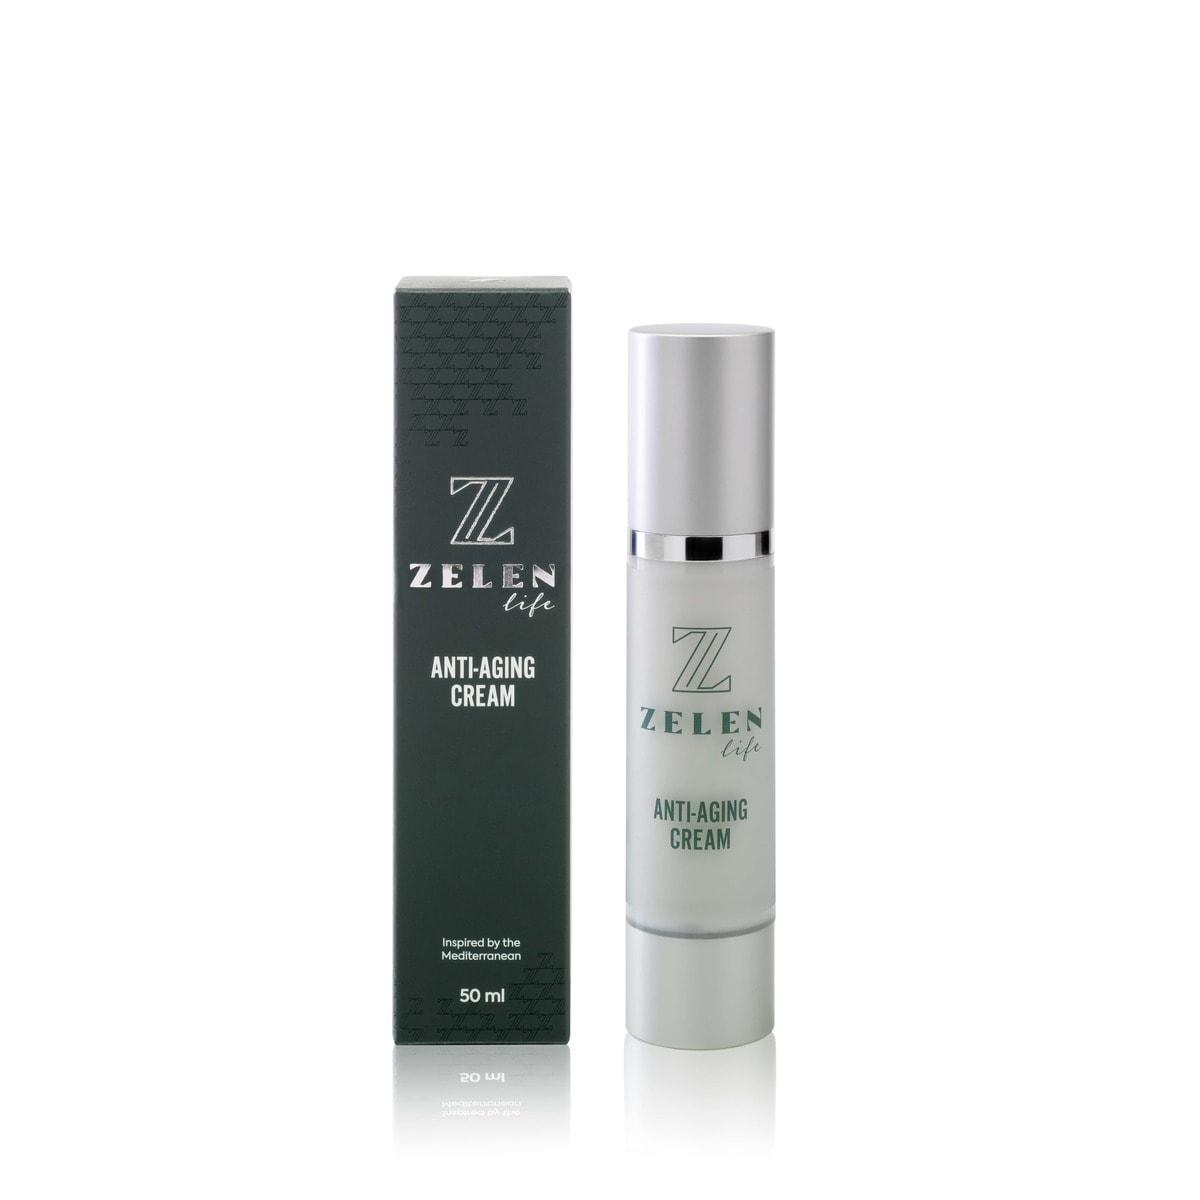 anti aging night cream zelen life